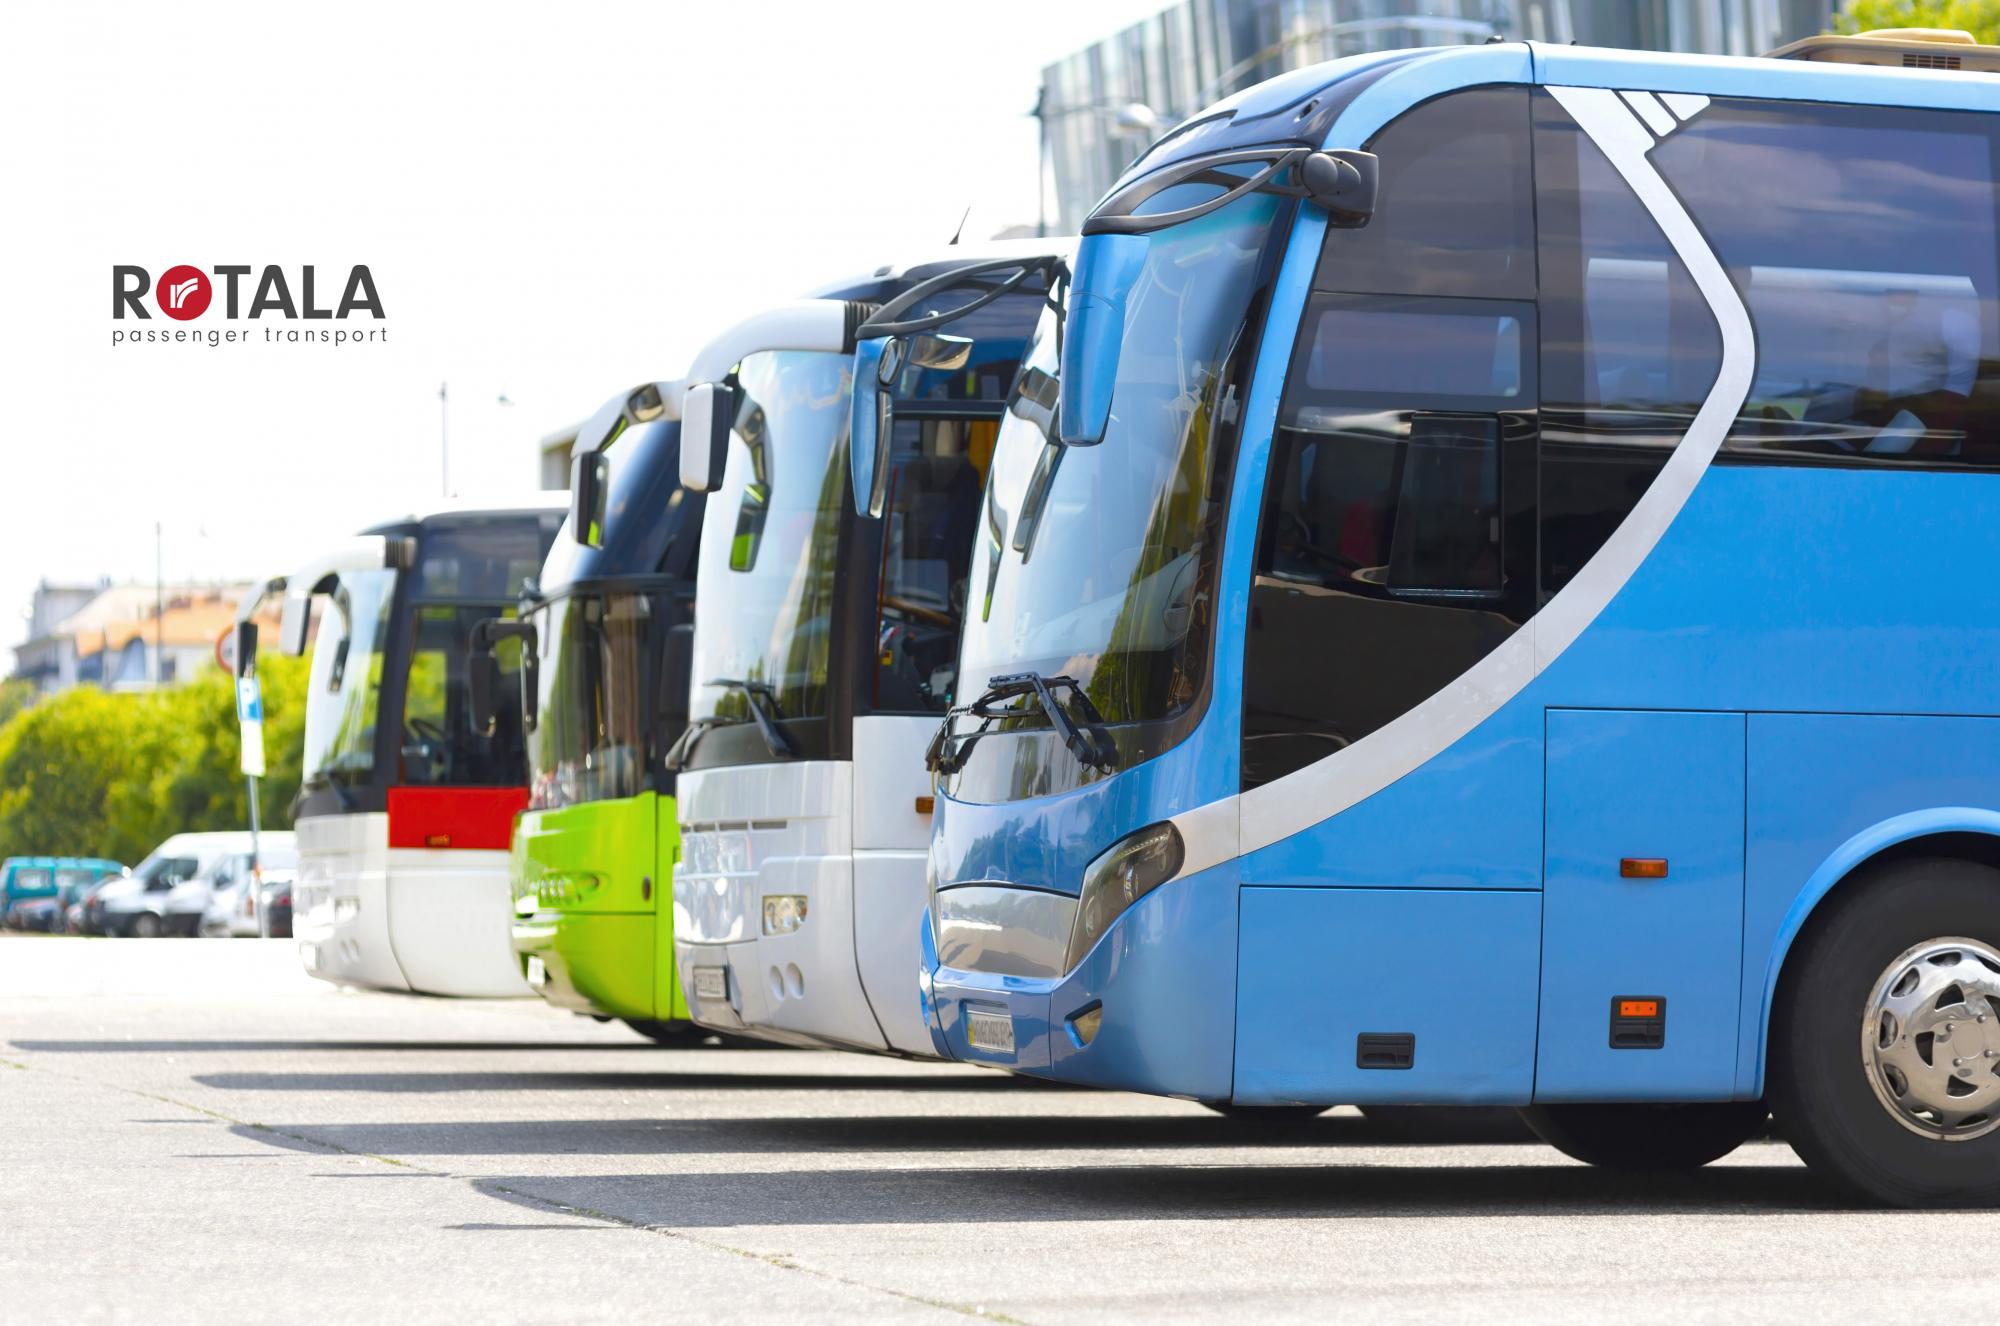 STOCK - Rotala - Bus 002